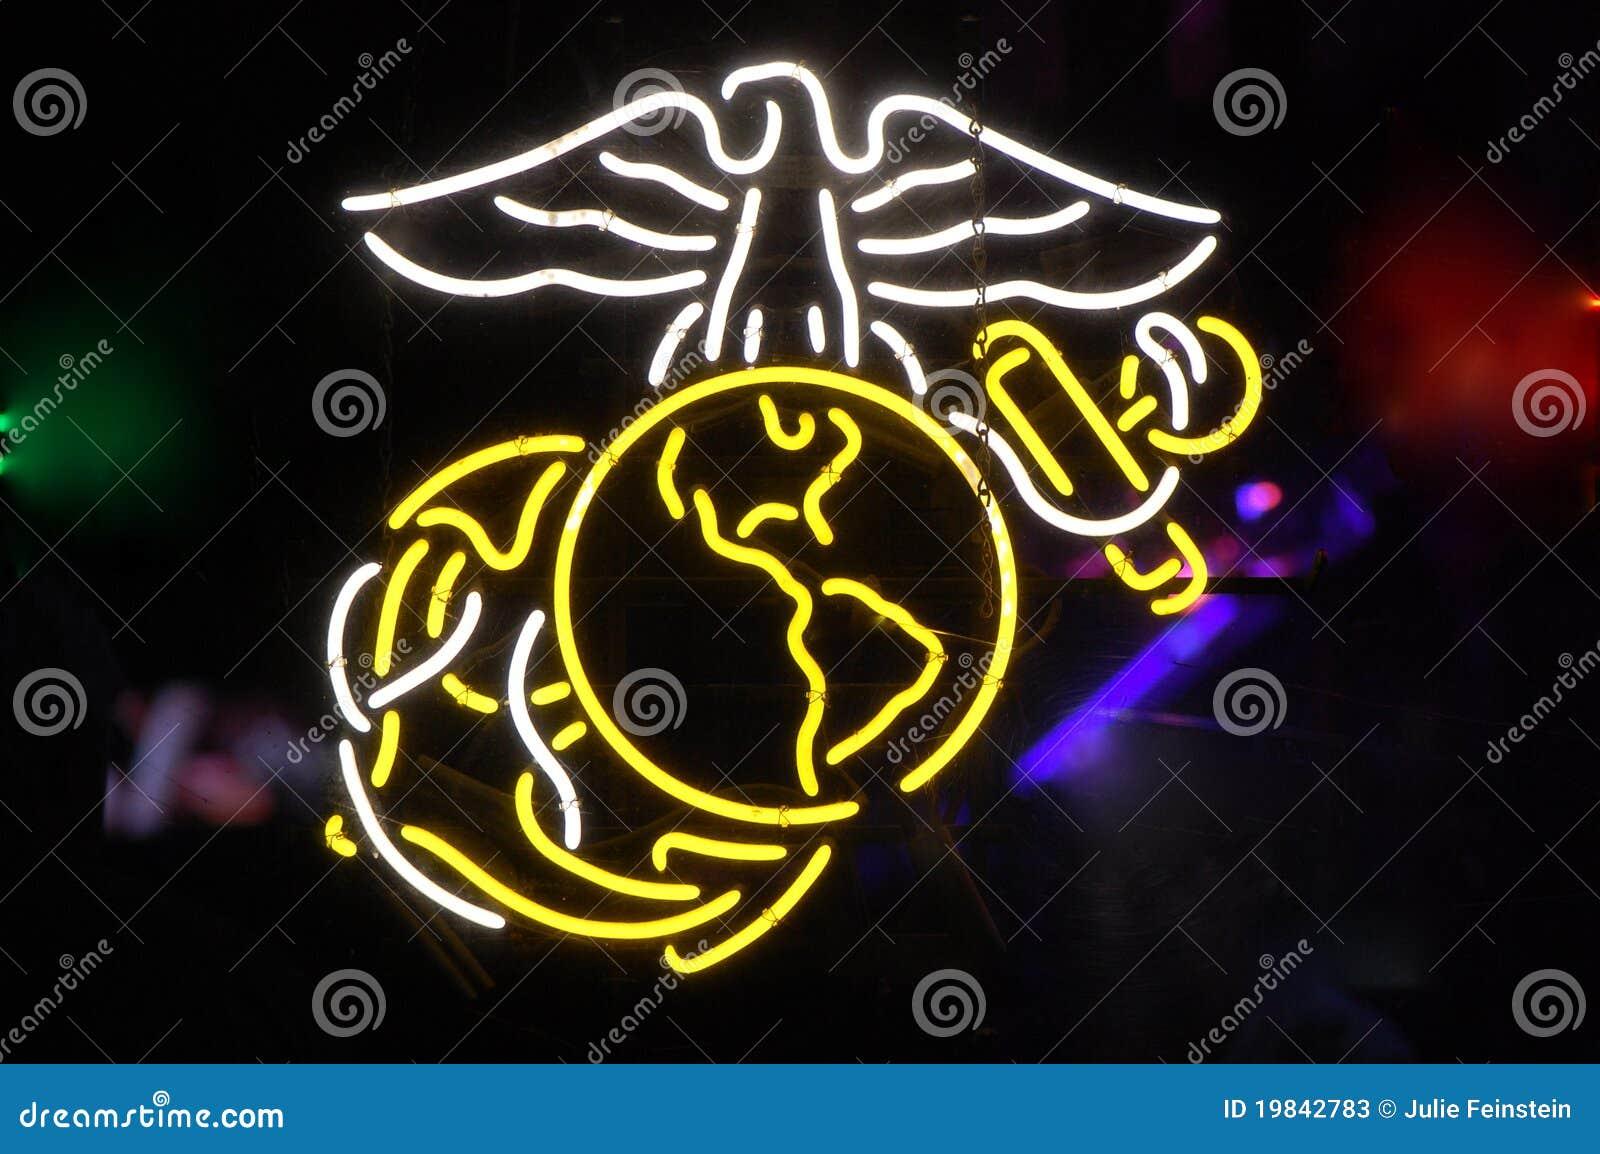 Neon Us Marine Corps Symbol Stock Image Image Of Soldiers Marines